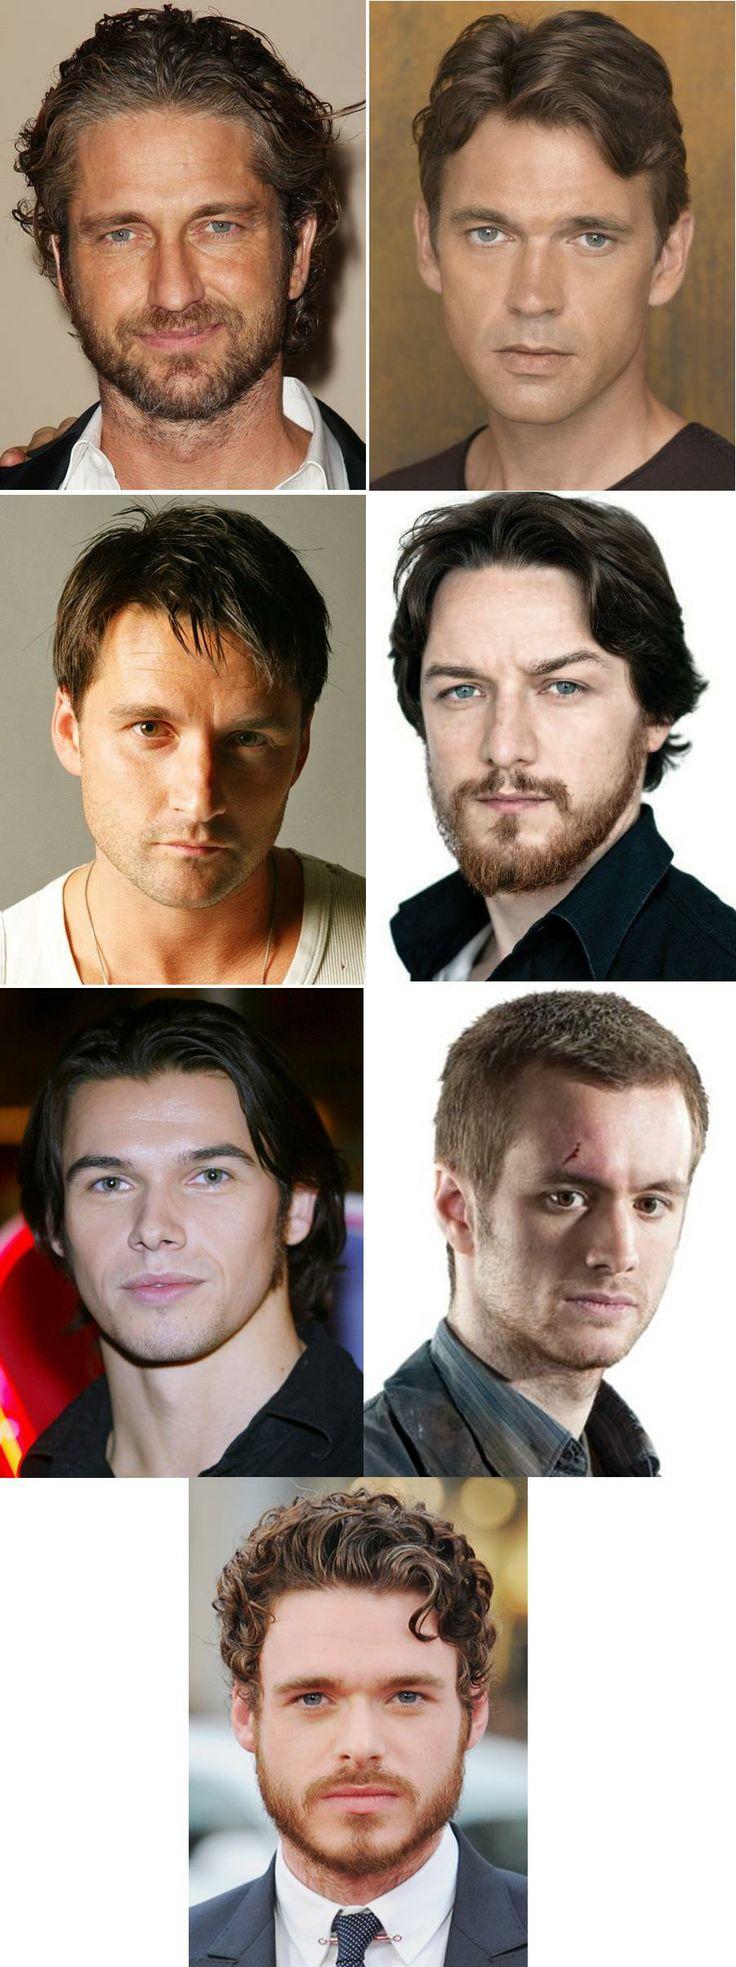 Sexy Scotsmen for a new story idea: Gerard Butler, Dougray Scott, Alastair Mackenzie, James McAvoy, Paul Telfer, Sean Biggerstaff, and Richard Madden